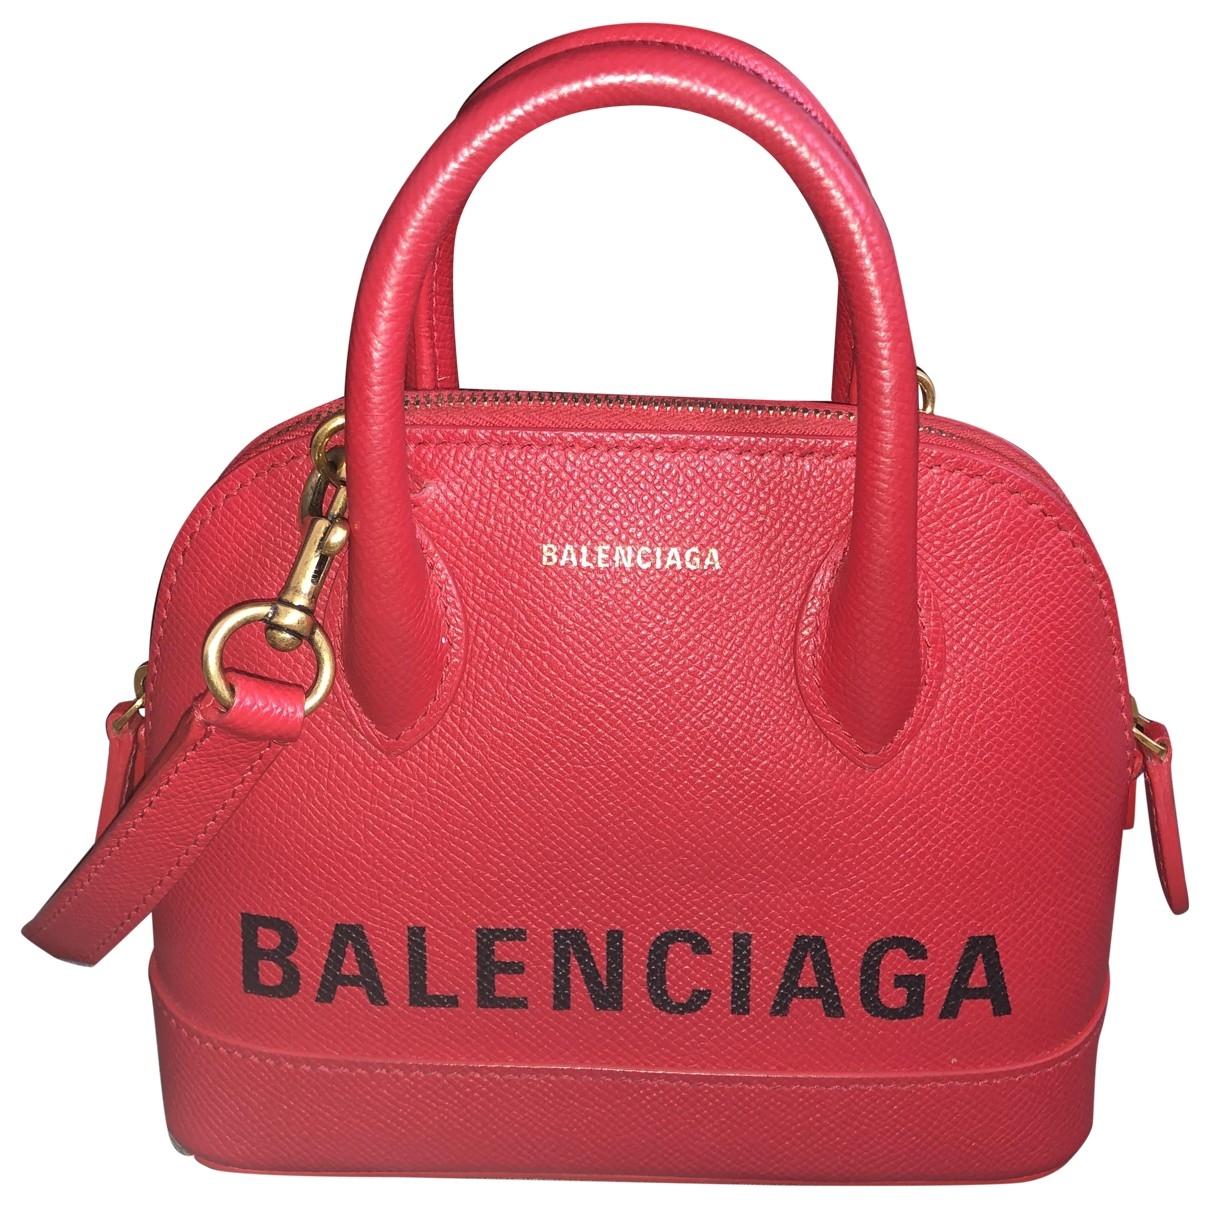 Balenciaga - Sac a main Ville Top Handle pour femme en cuir - rose